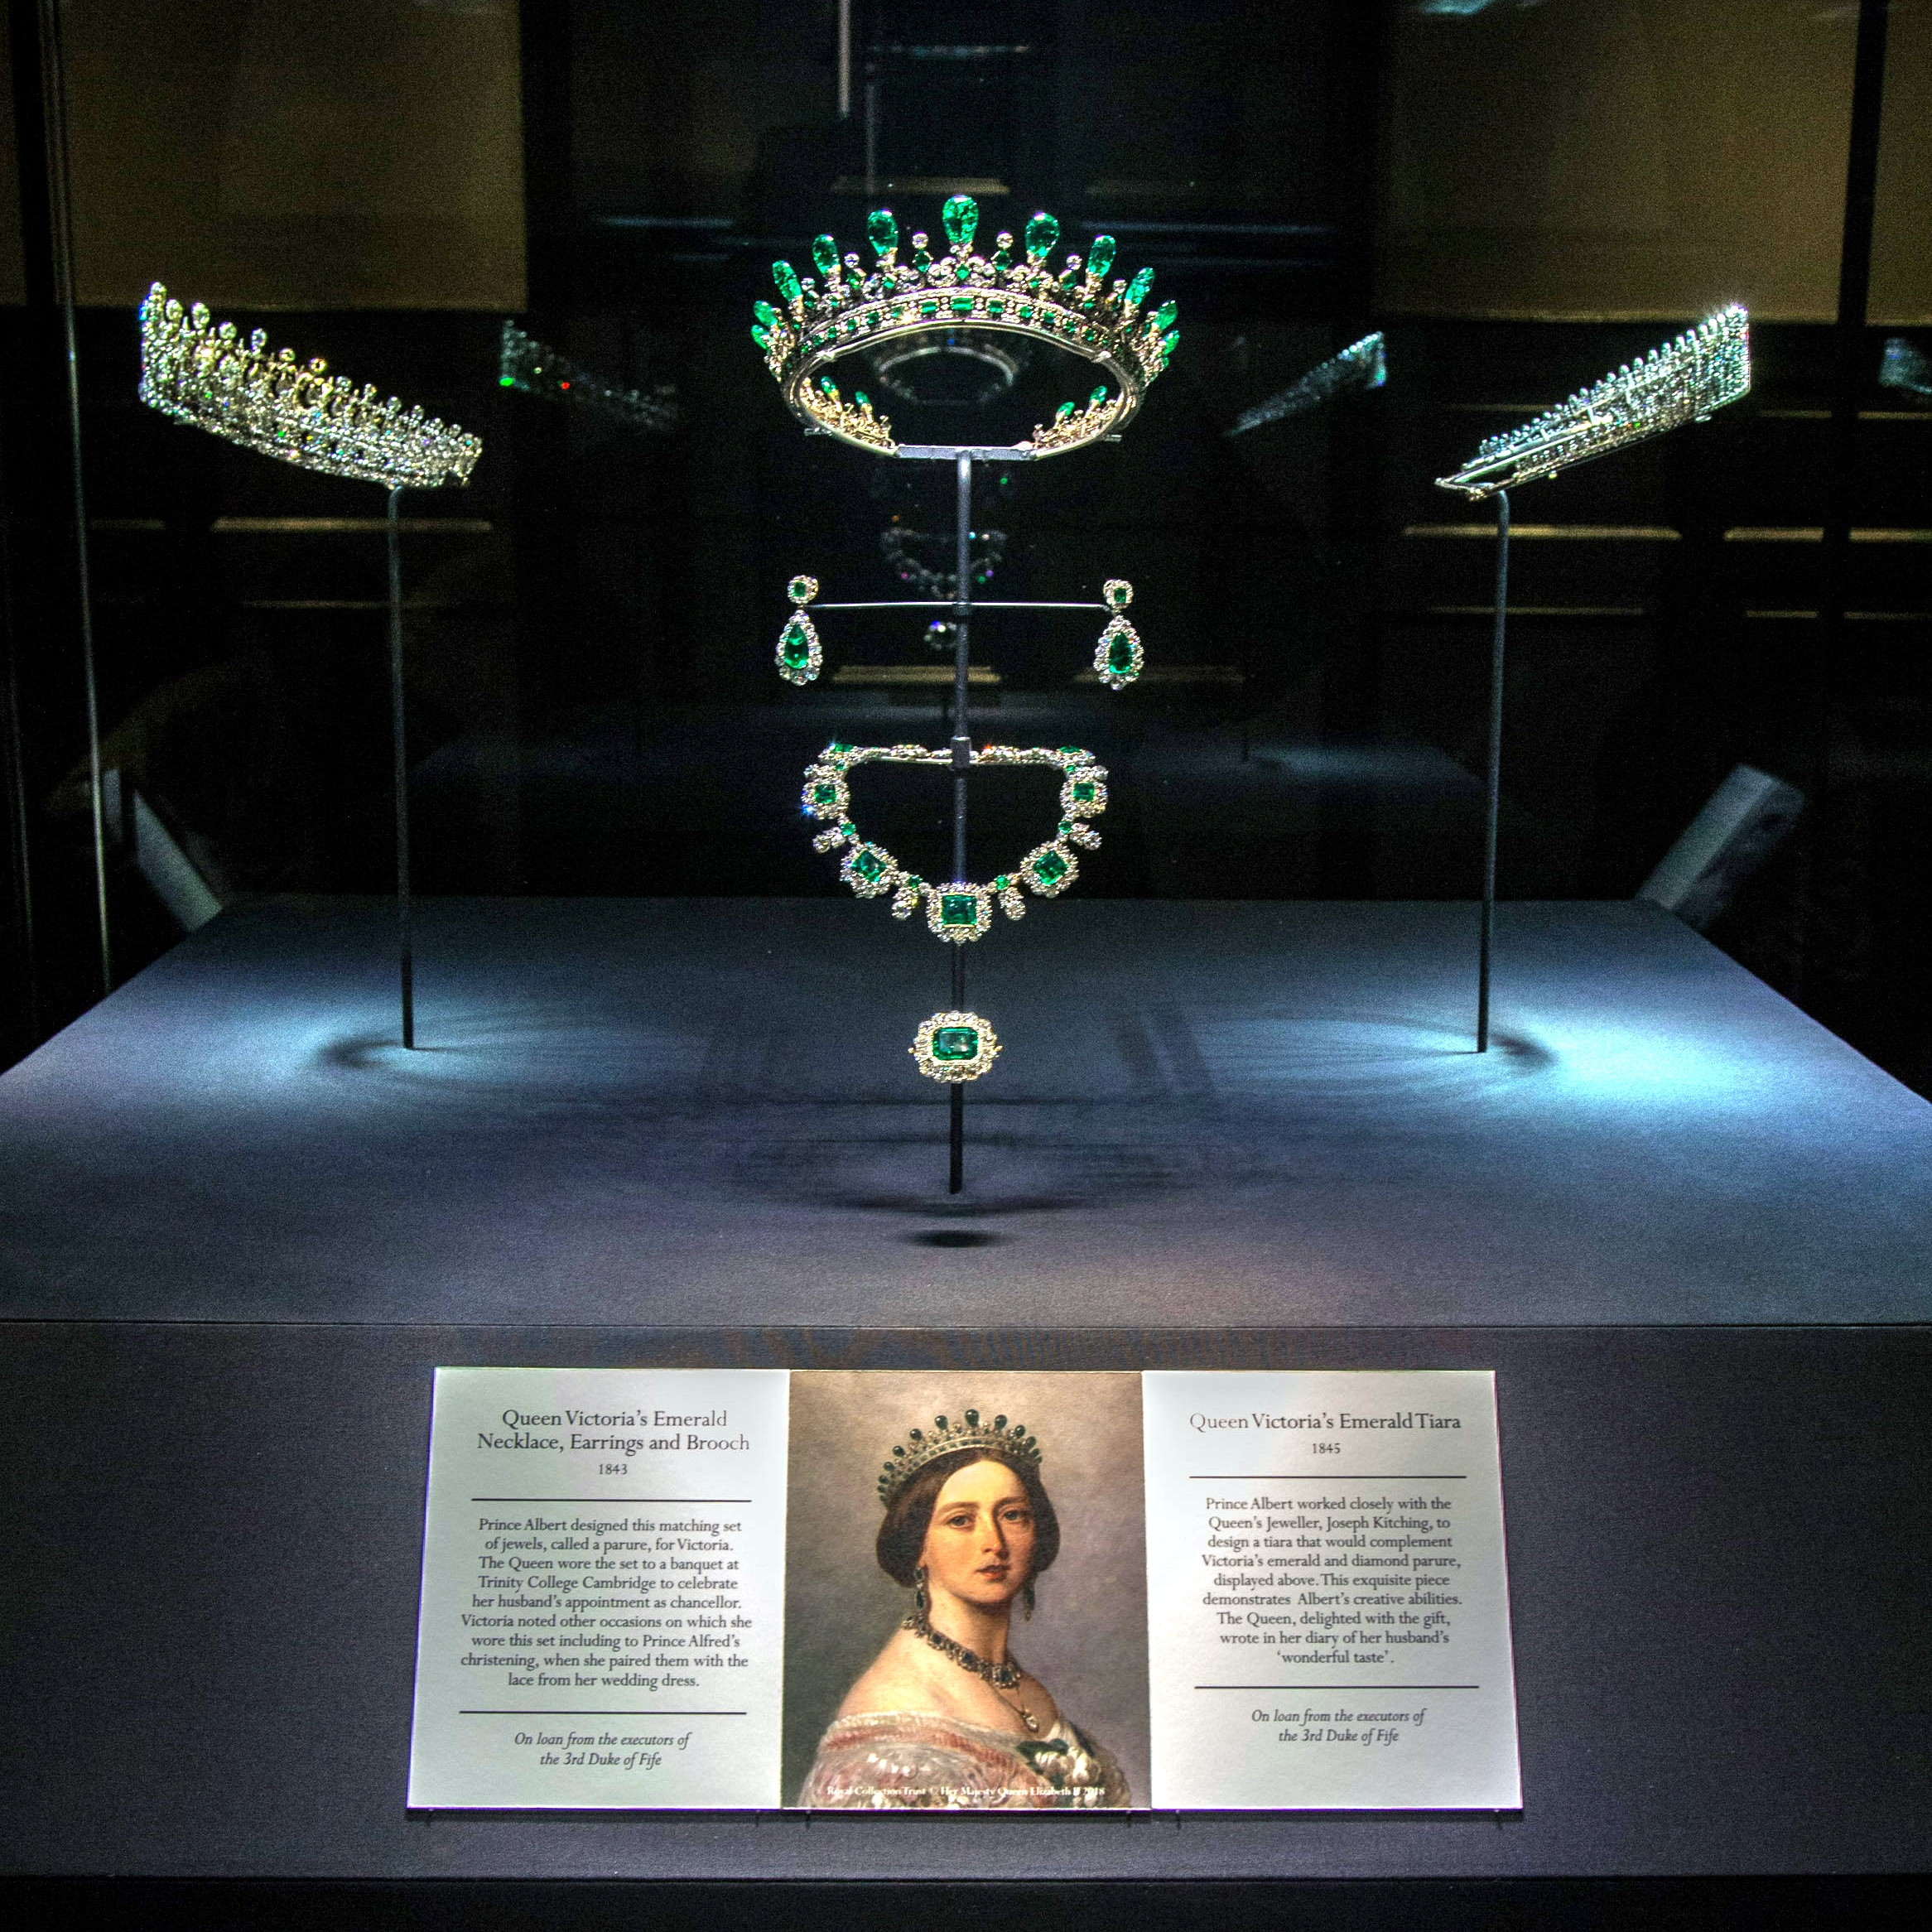 Kokoshnik tiara is seen in upper right corner of display